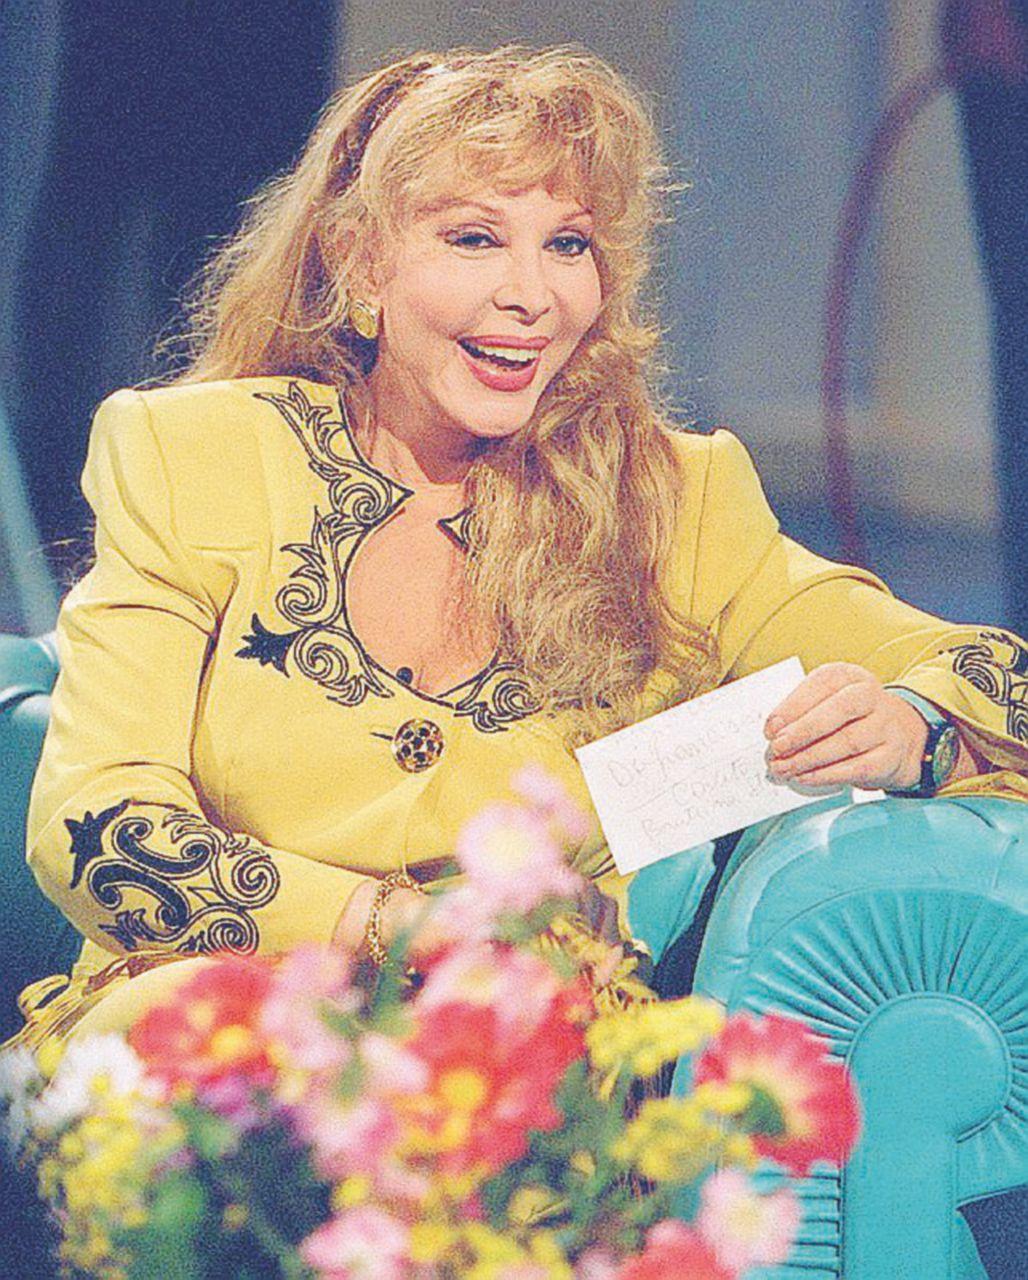 Addio a Isabella Biagini, da attrice a soubrette bionda in bianco e nero